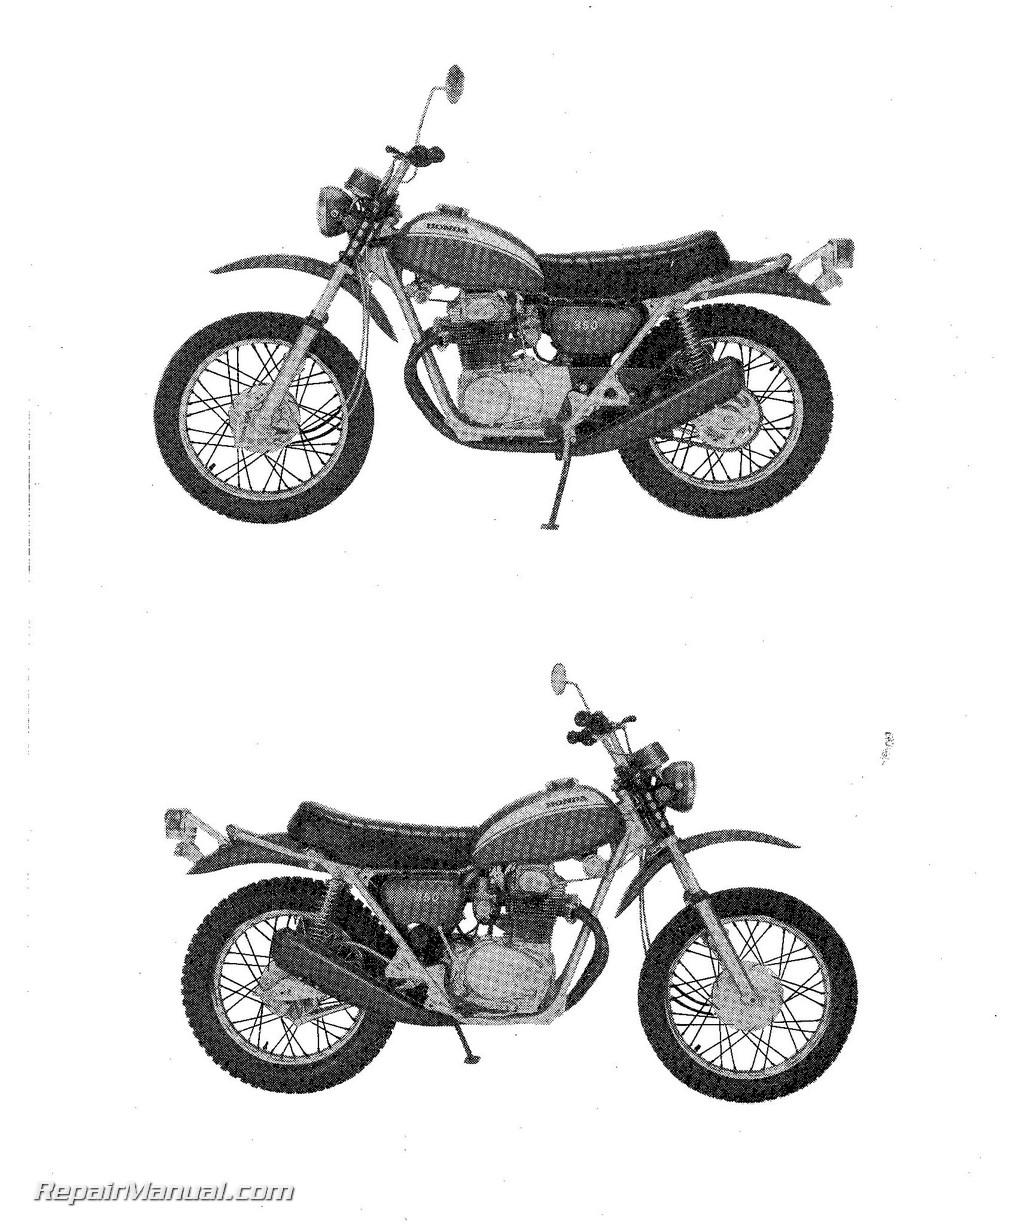 1970-1971 Honda SL350K1 Motosport Motorcycle Parts List